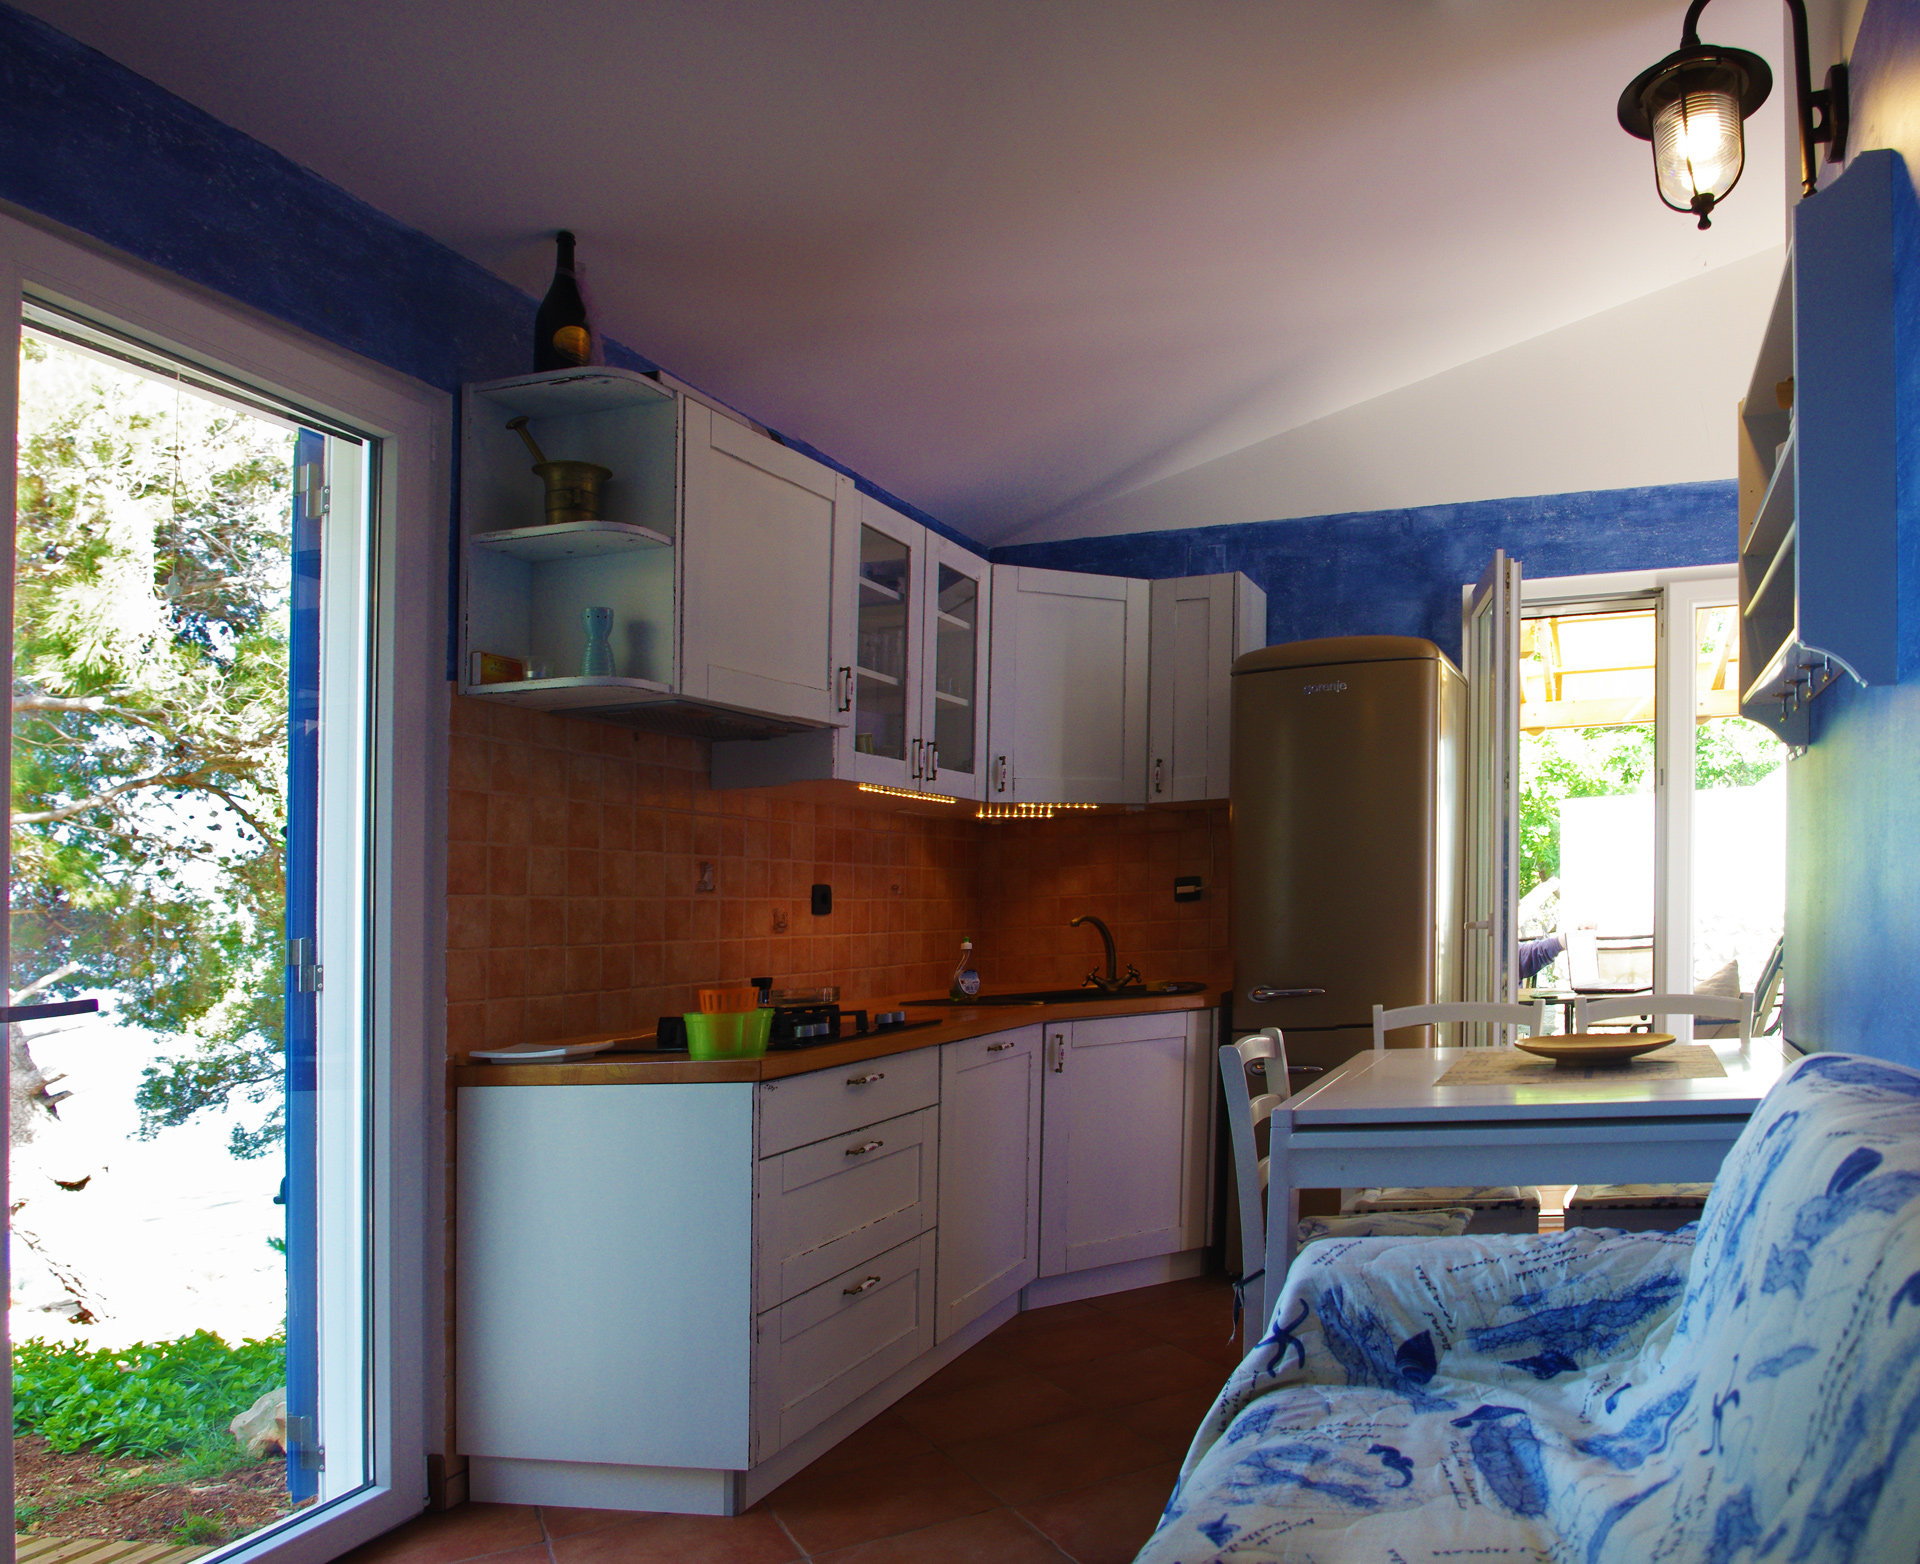 Adriana Stani Houses Designs Html on